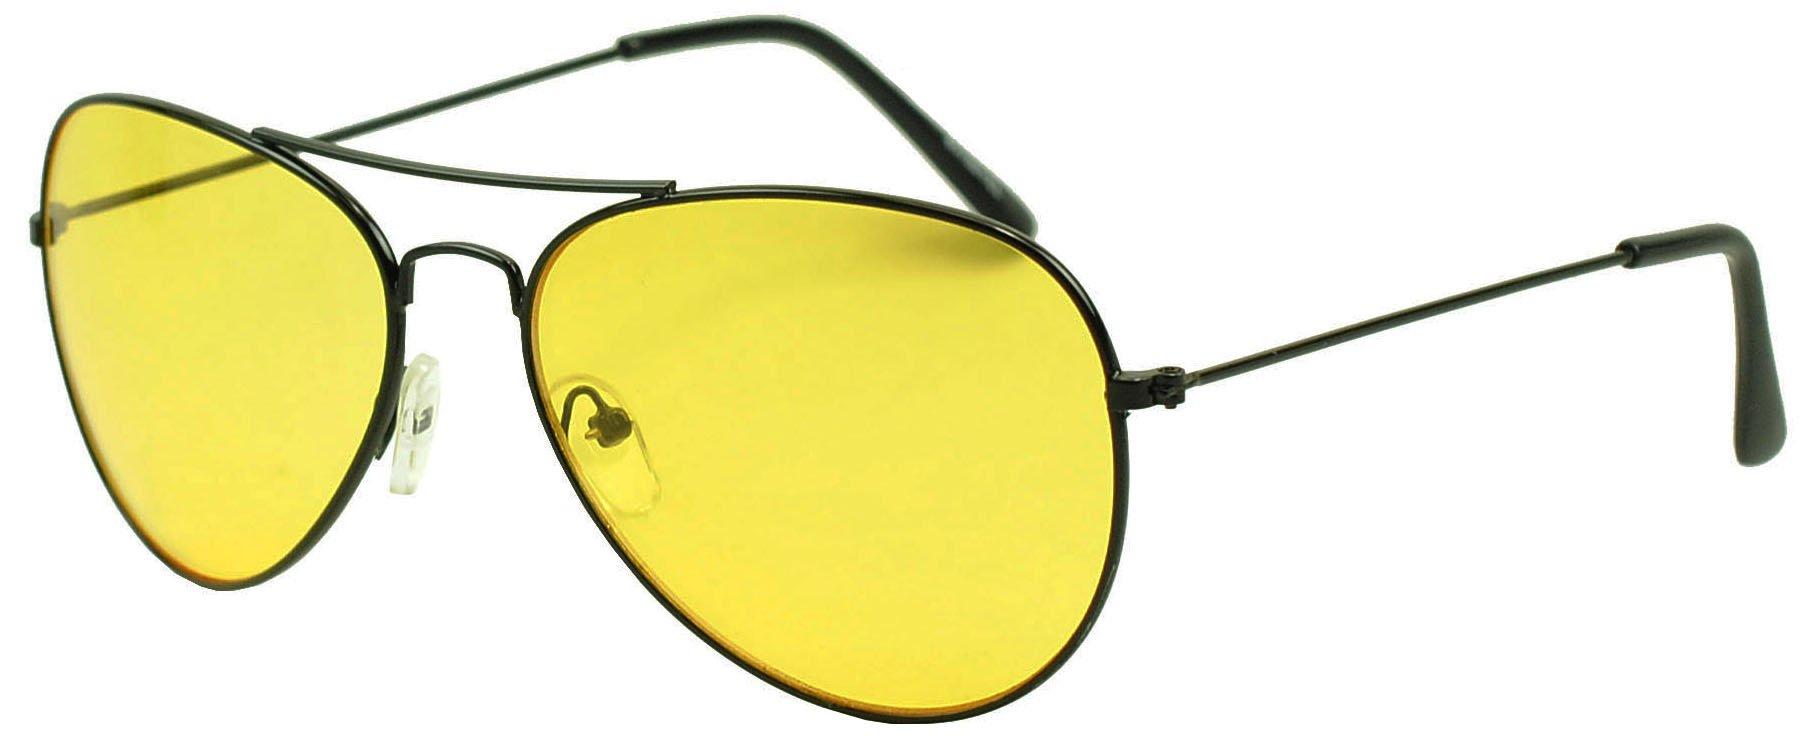 SunglassUP - Oversized Round 80's Vintage Yellow Night Driving Aviator Sunglasses (Black (Metal), Yellow) by SunglassUP